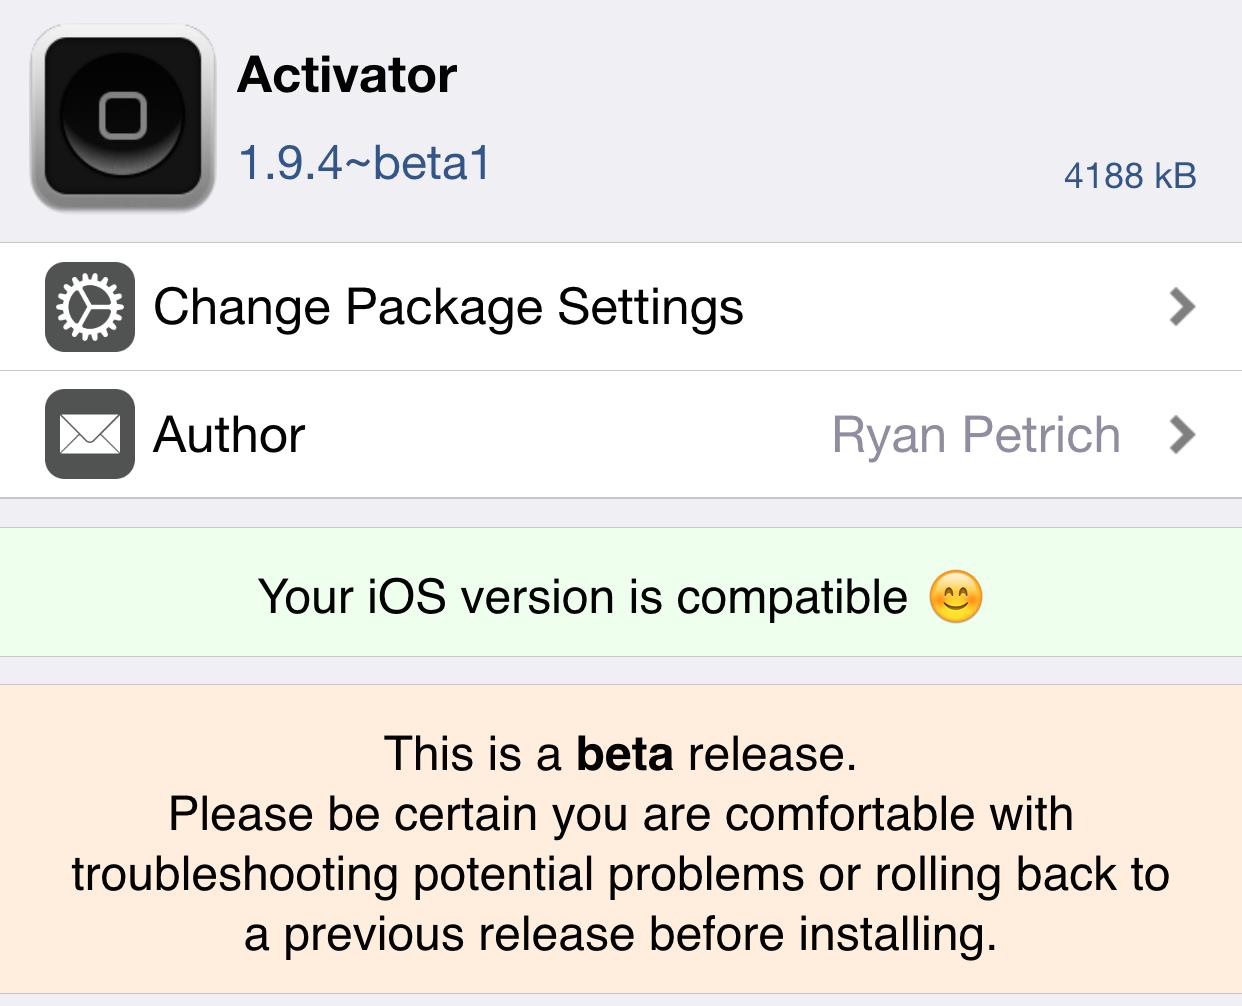 Activator 1.9.4 beta 1